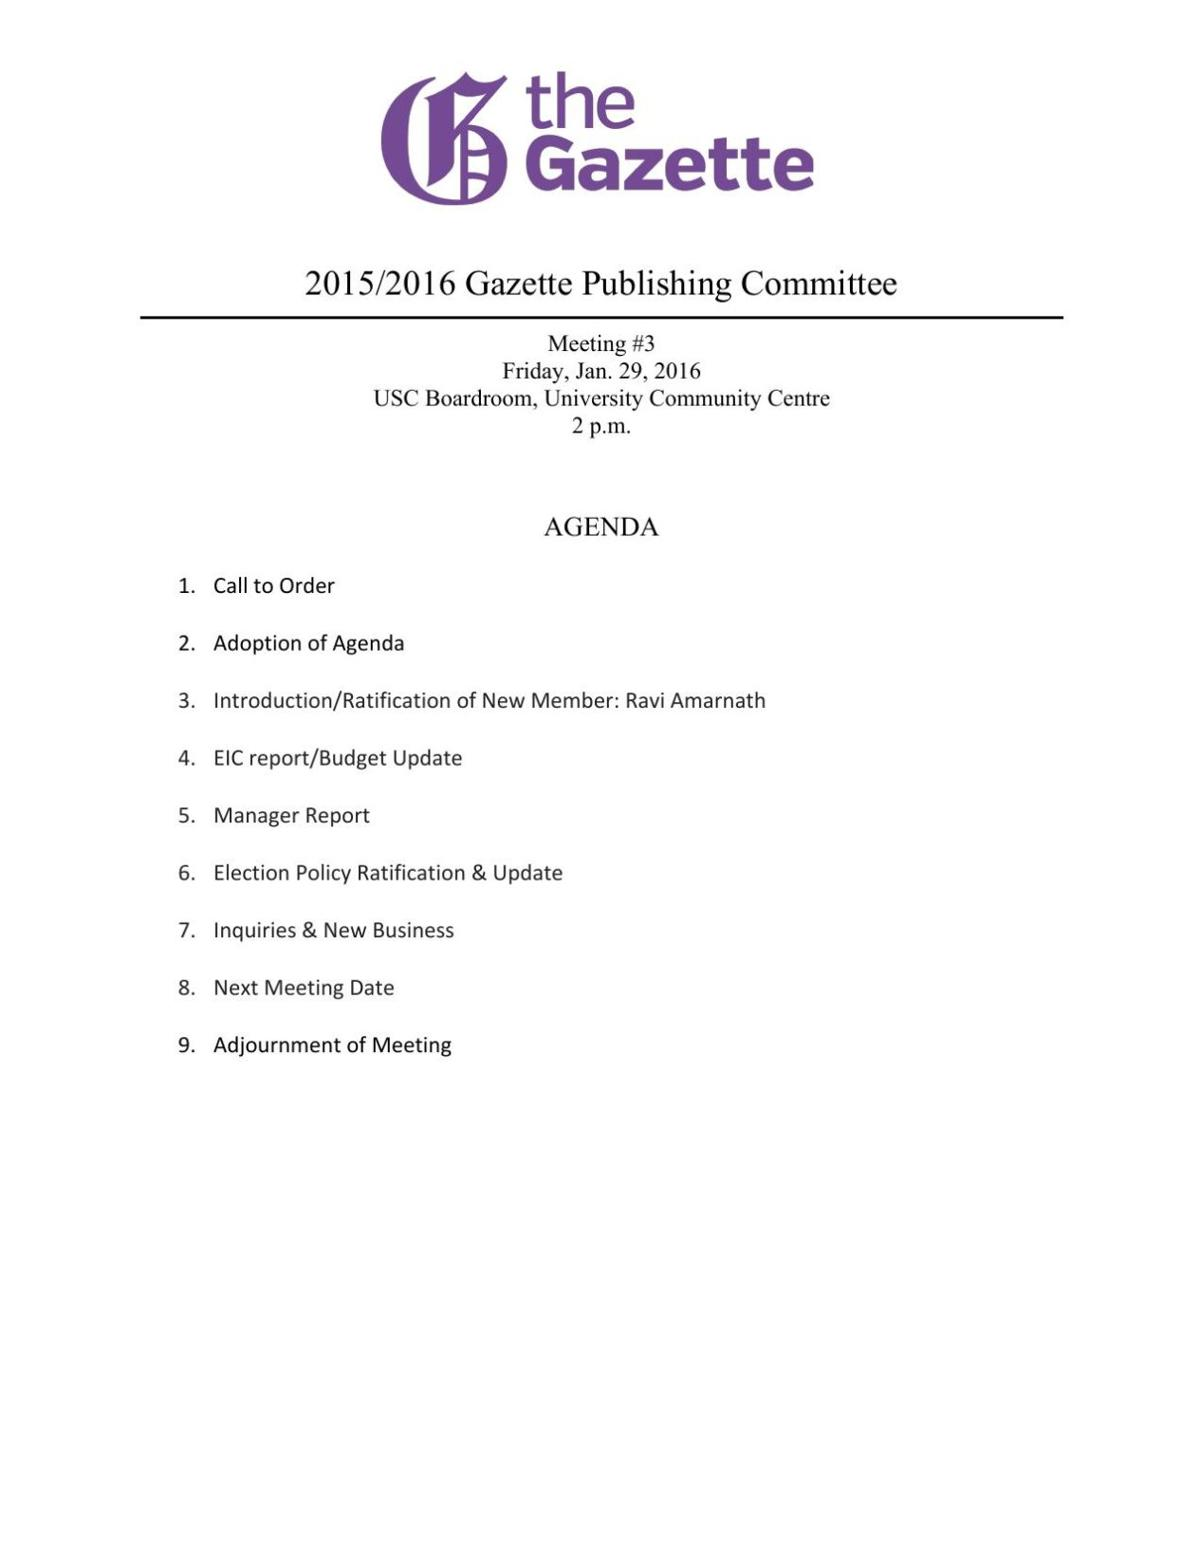 Publications Commitee January 29, 2016